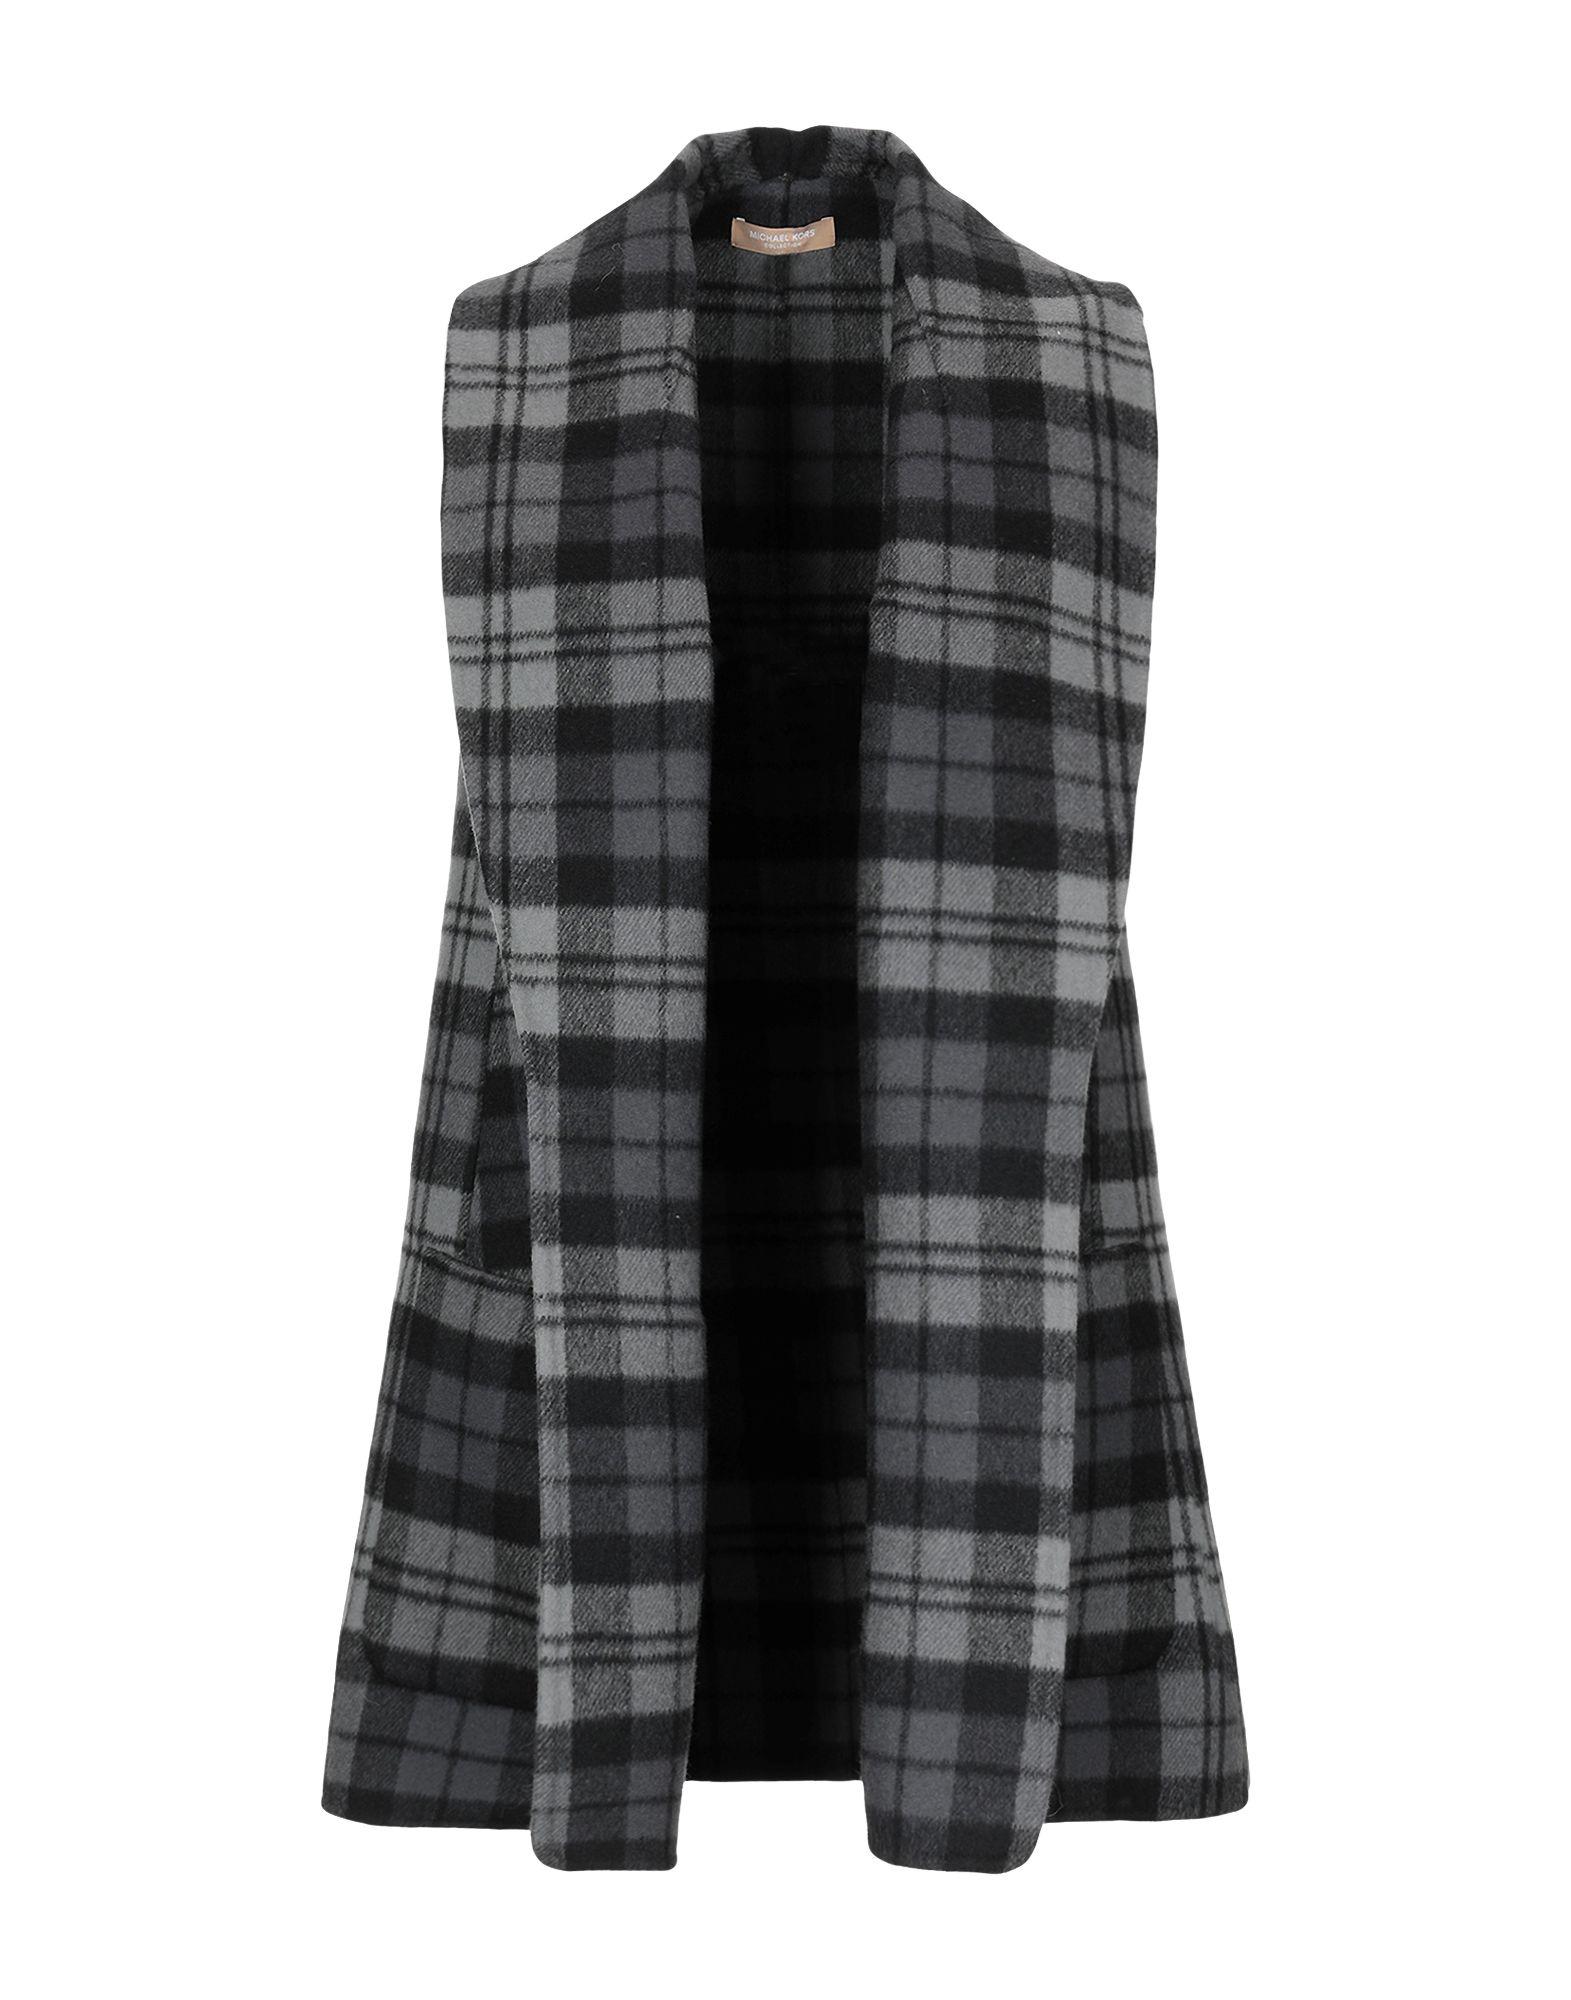 MICHAEL KORS COLLECTION Легкое пальто